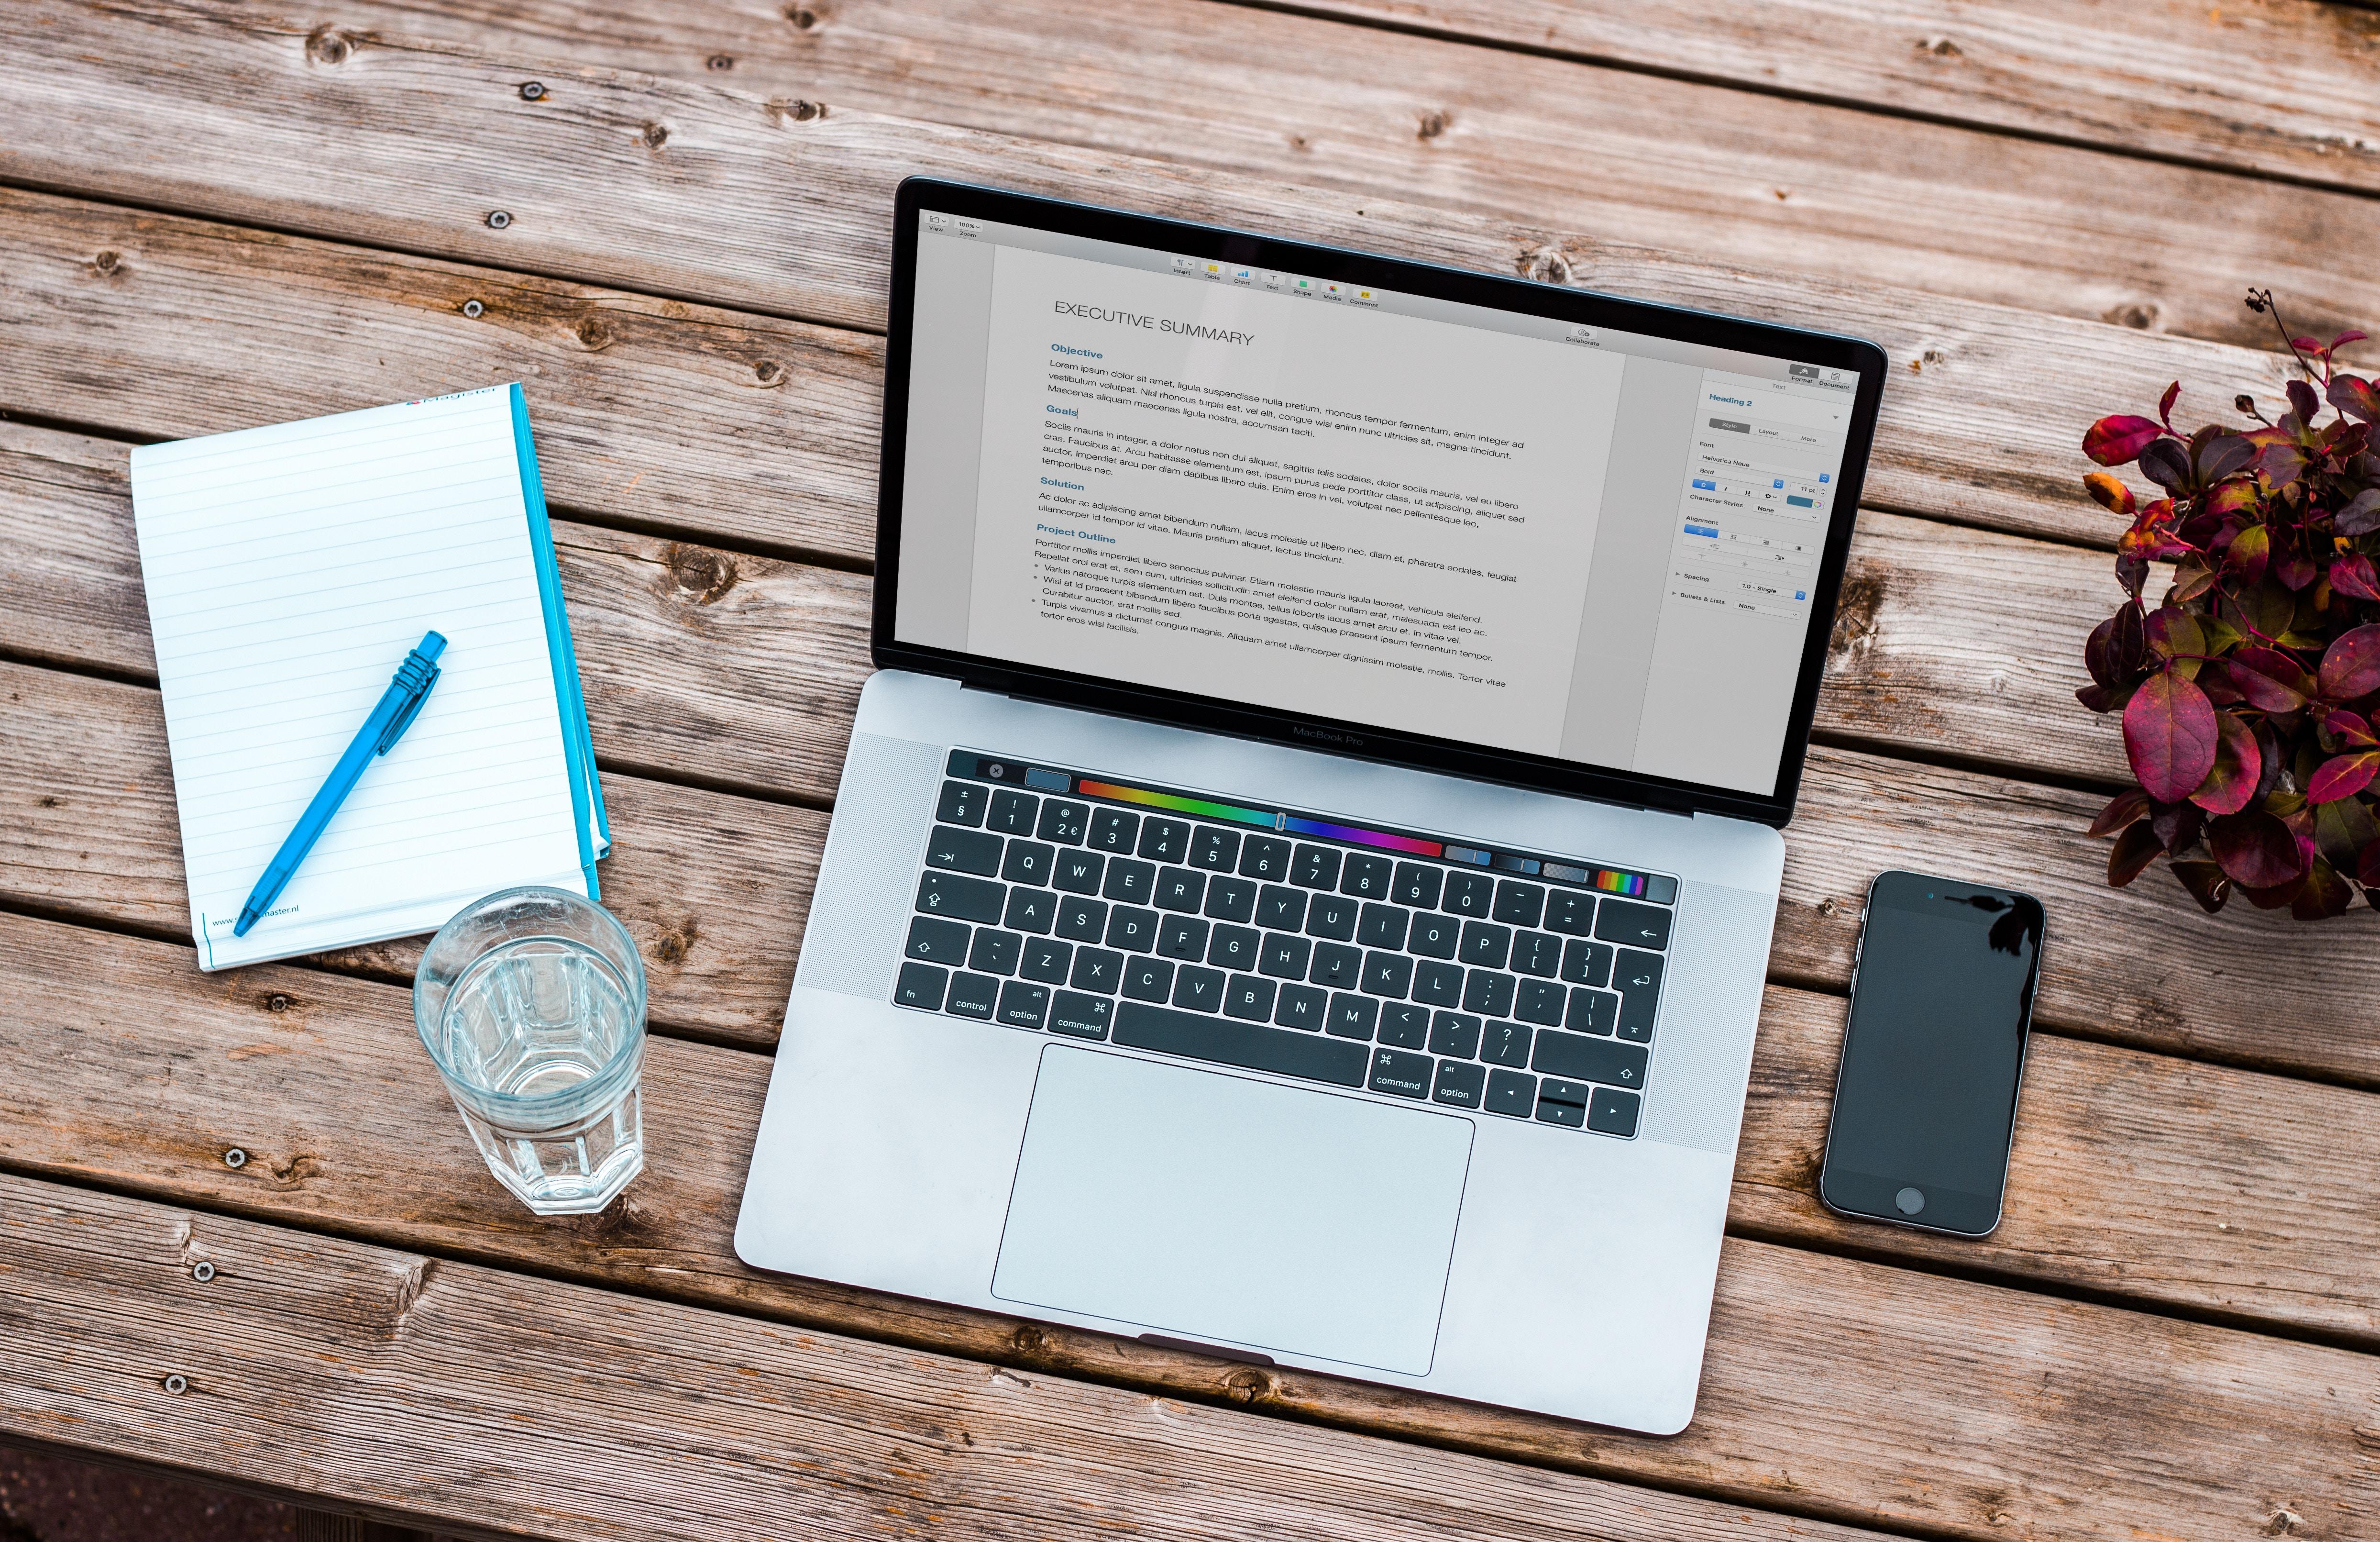 Review | CLEP Exam preperation from Study.com